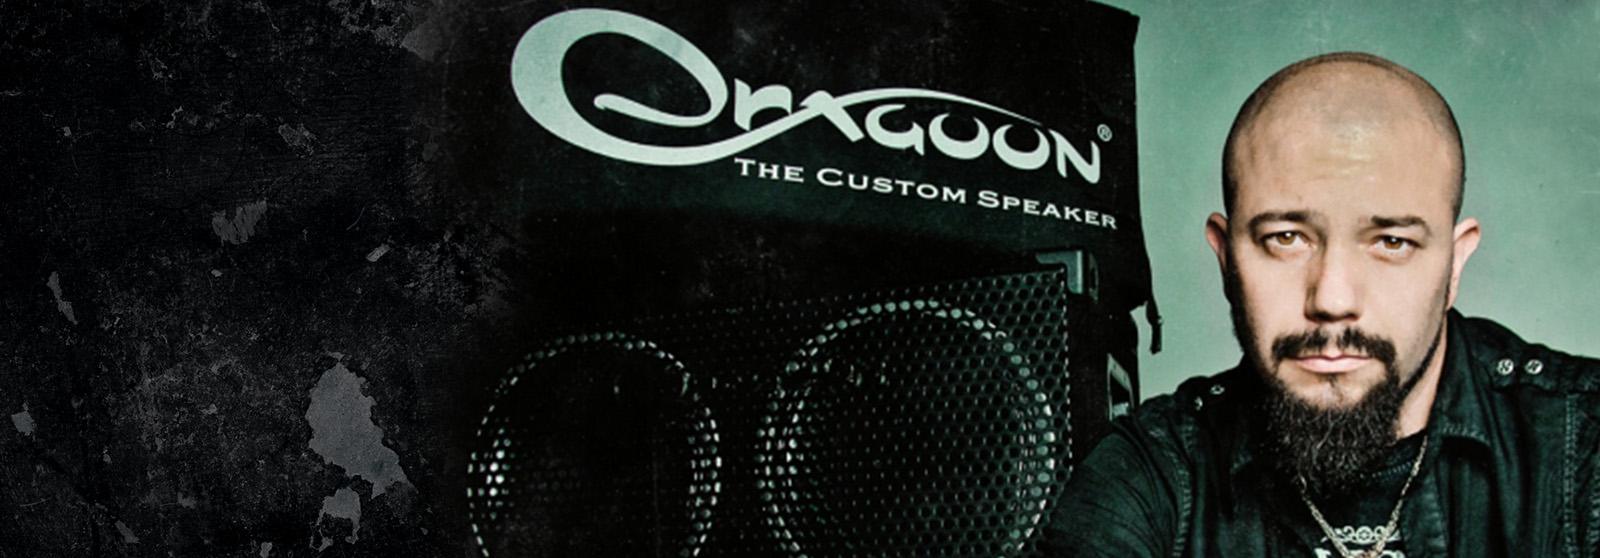 Dragoon - The Custom Speaker - GABRIELE-RUSTICHELLI_20160225225328602075.jpg